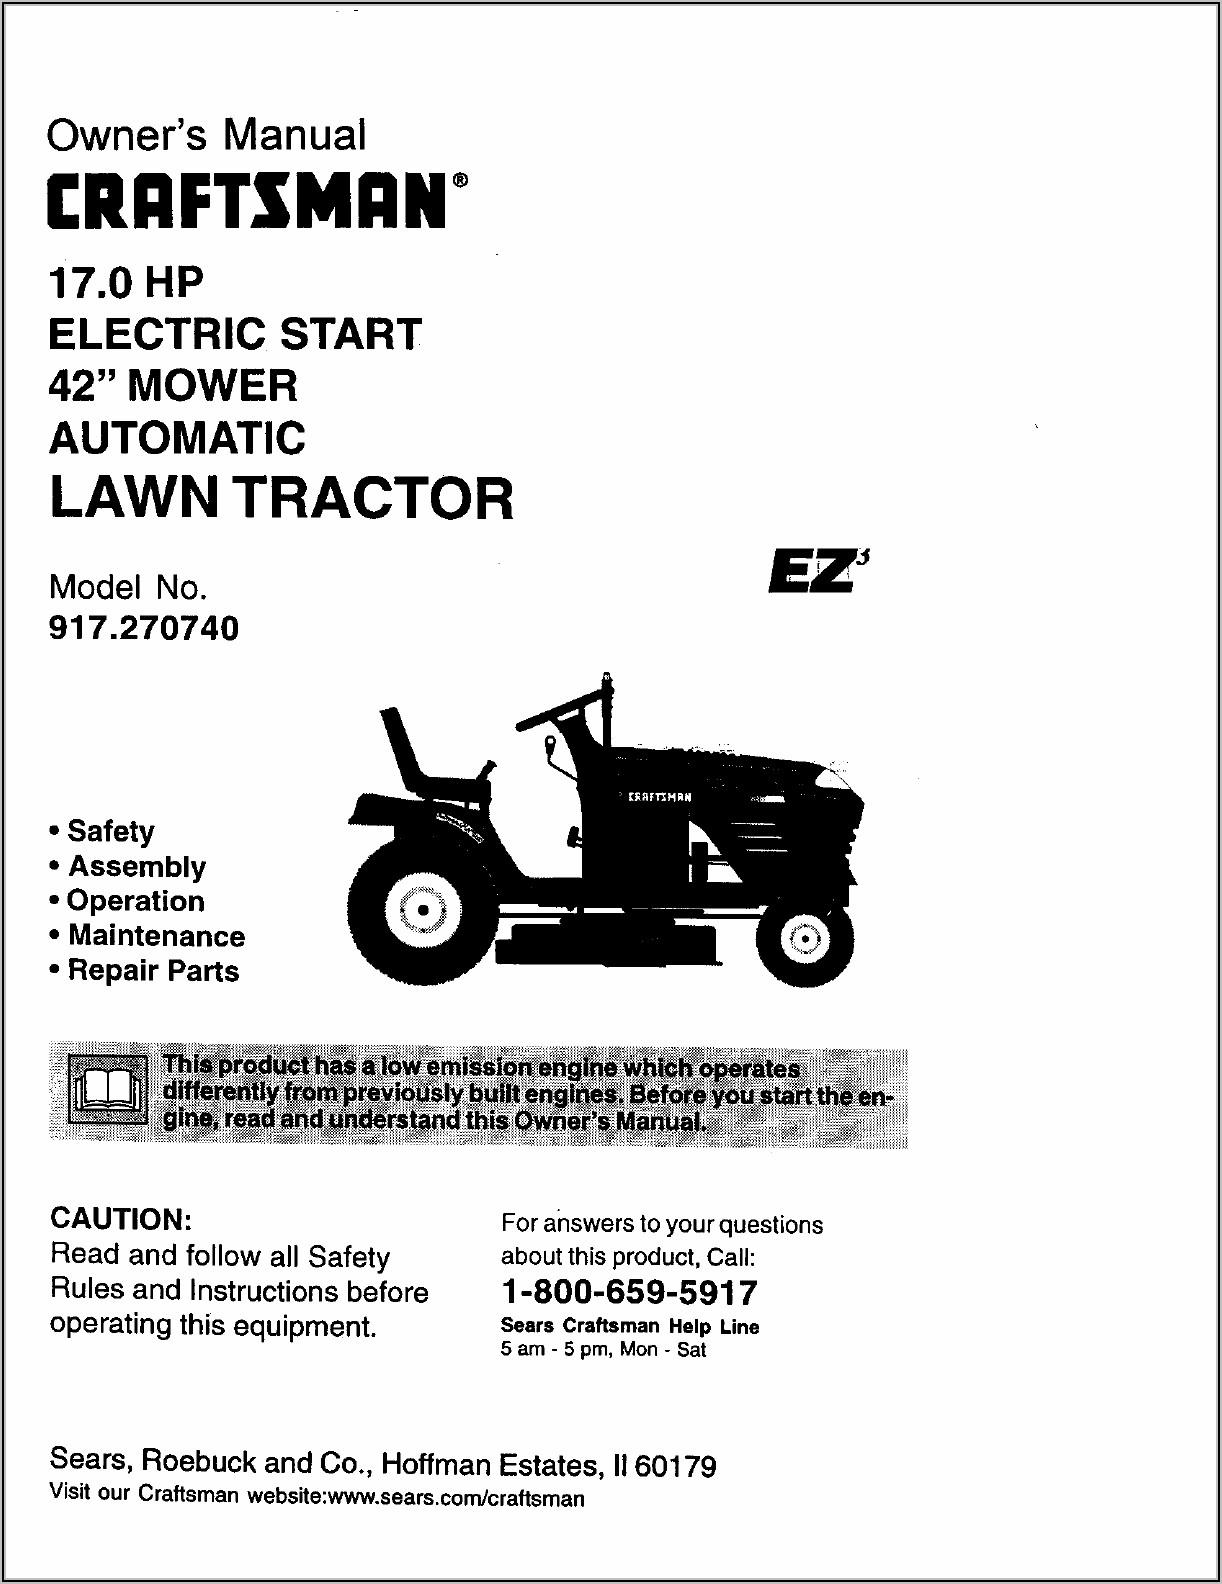 Craftsman 42 Inch Riding Lawn Mower Drive Belt Diagram